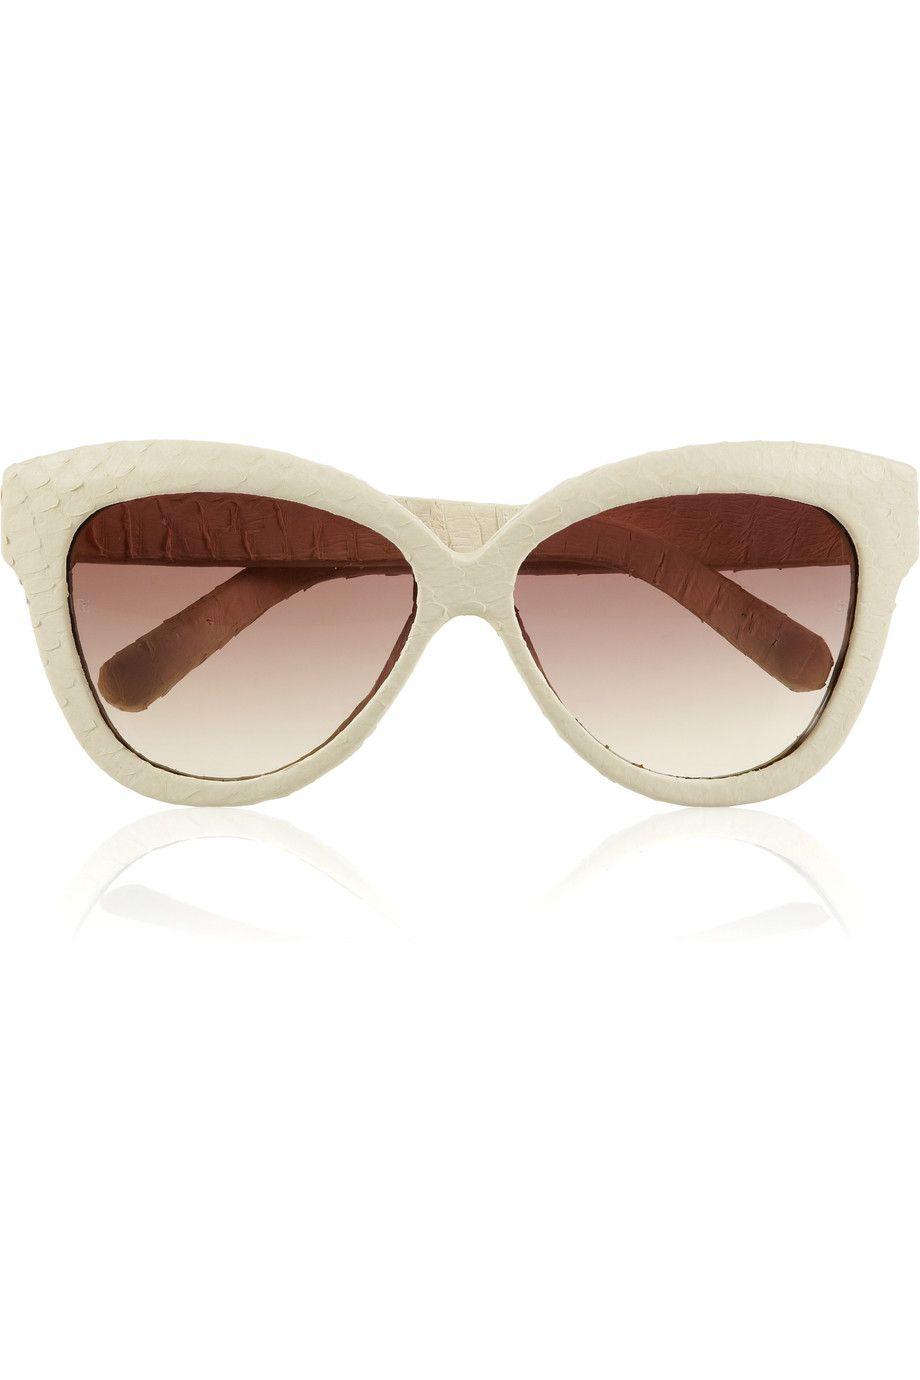 010a27214f6f Linda Farrow Luxe Cat eye snakeskin sunglasses